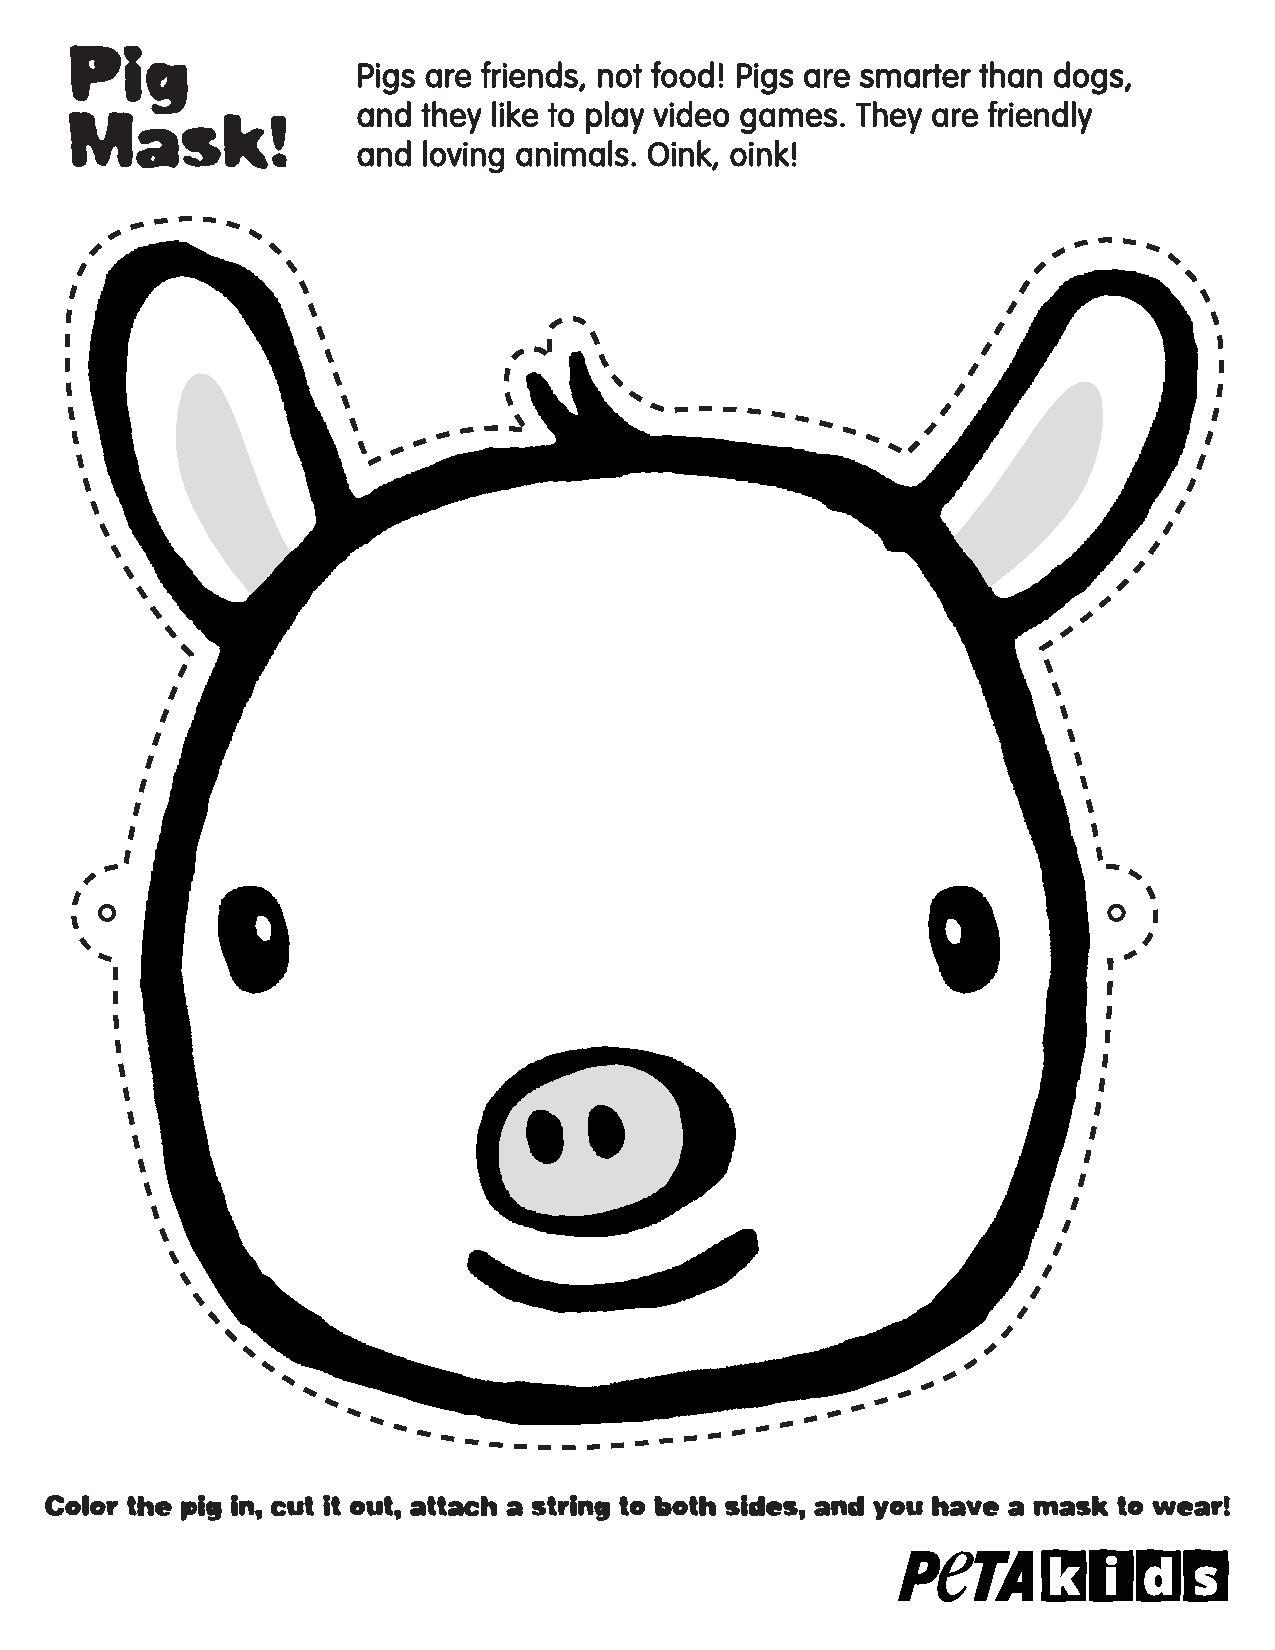 PETA Kids Pig Mask